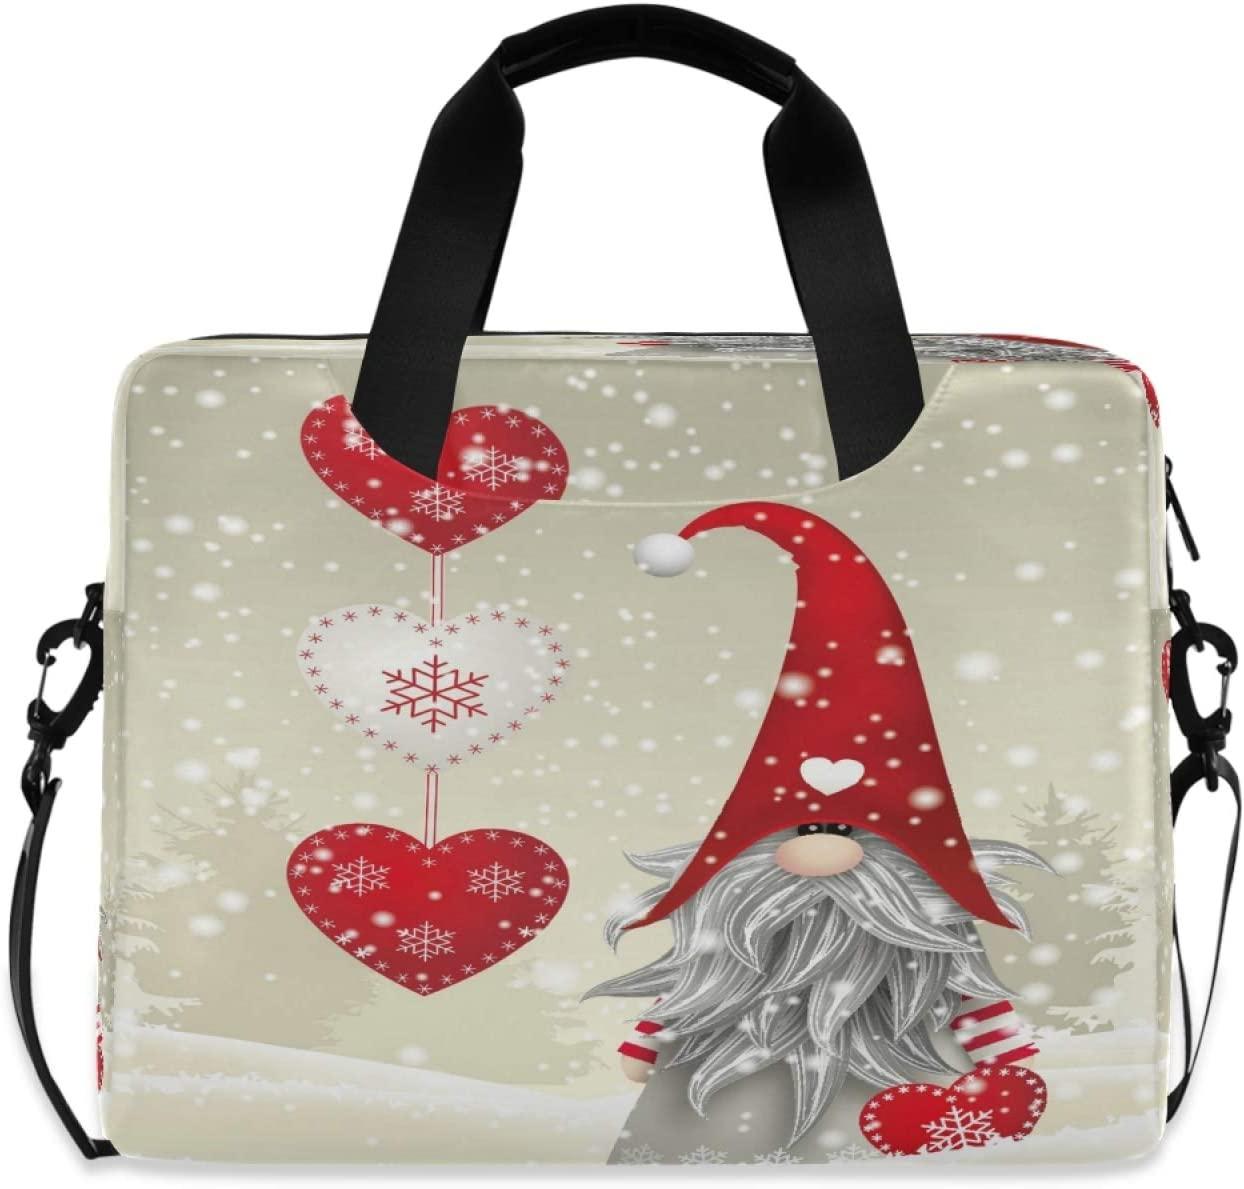 Yulife Christmas Snowman Gnome Laptop Bag Sleeve Case for Women Men Winter Snow Folklore Elve Briefcase Tablet Messenger Shoulder Bag with Strap Notebook Computer Case 14 15.6 16 Inch for Kids Girls